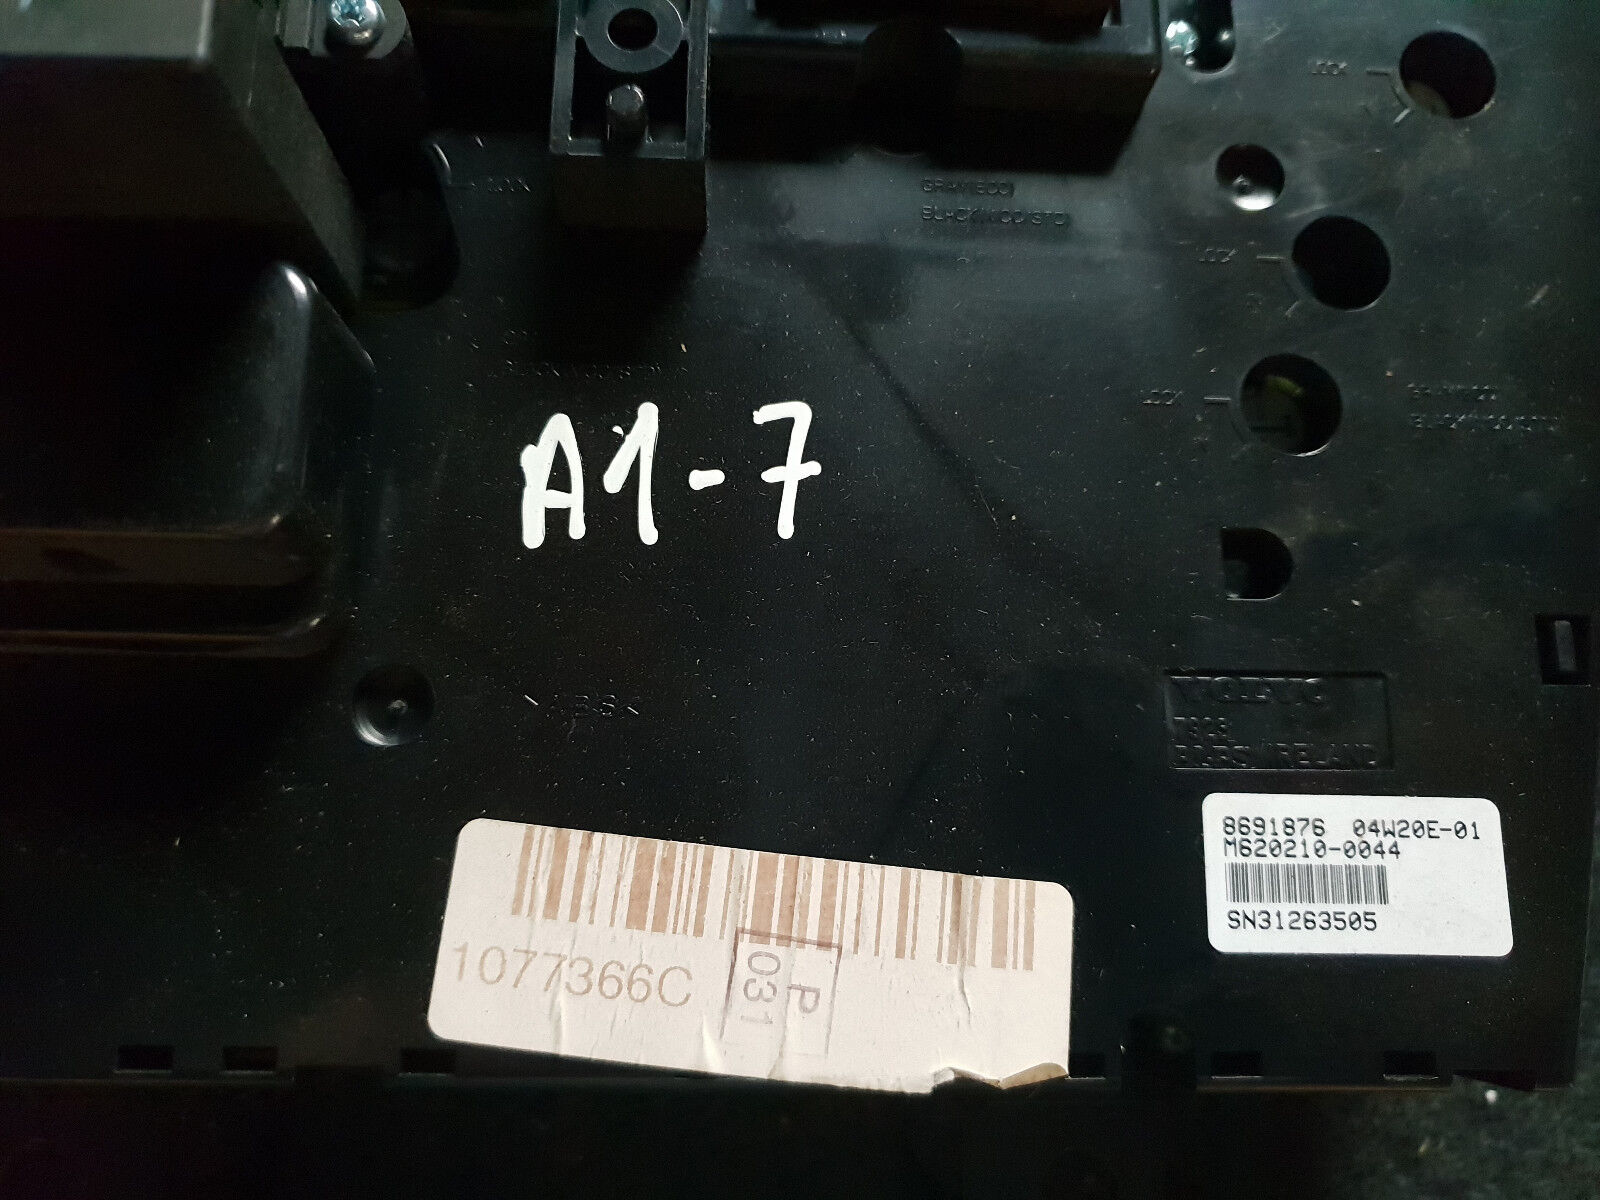 Volvo V70 S60 XC90 Heater Control 8691876